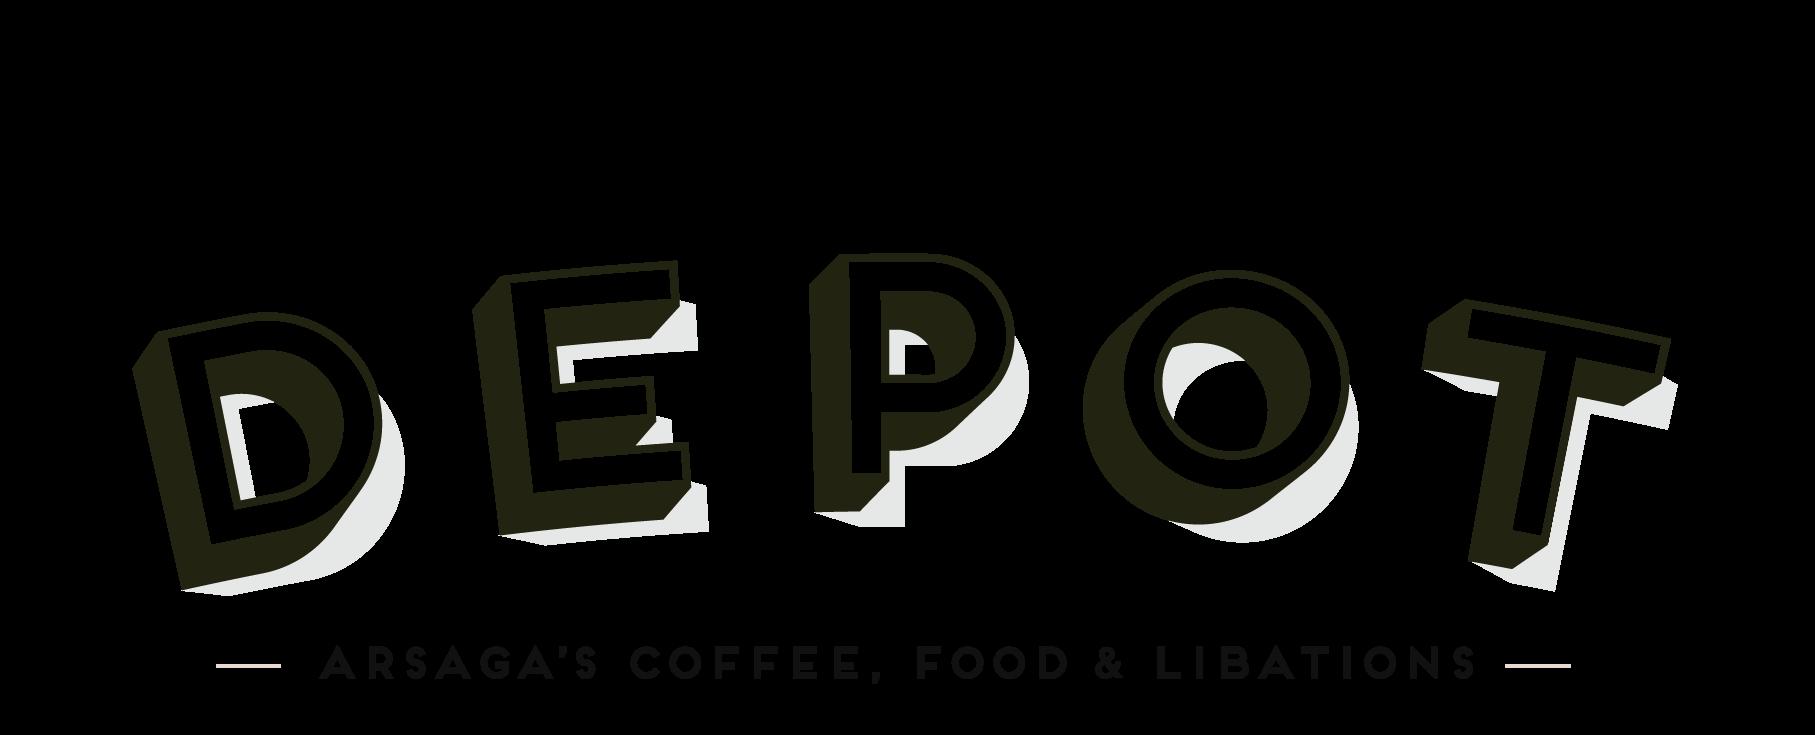 Depot Logo transparent copy.png